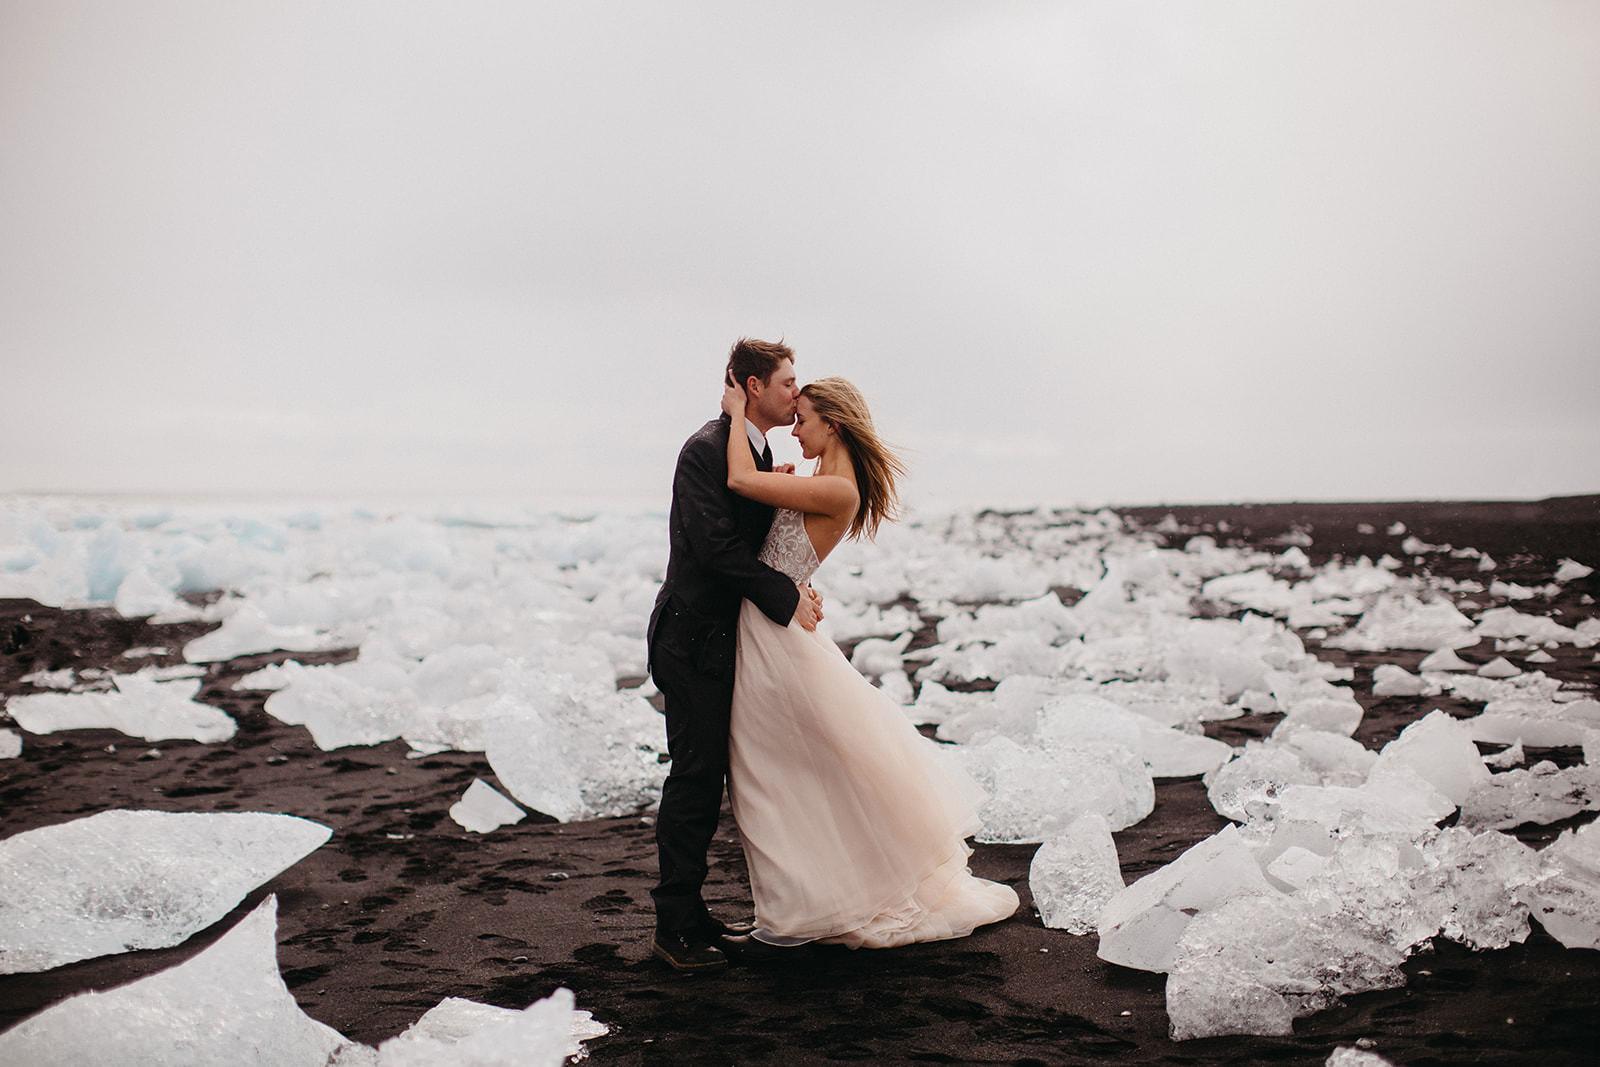 Icelandic Iceland Elopement Wedding Elope Photographer Eloping Reykjavík Vik Black Sand Beach Jökulsárlón Skogafoss Waterfall Vestrahorn Mountain Liz Osban Photography Destination 55.jpg